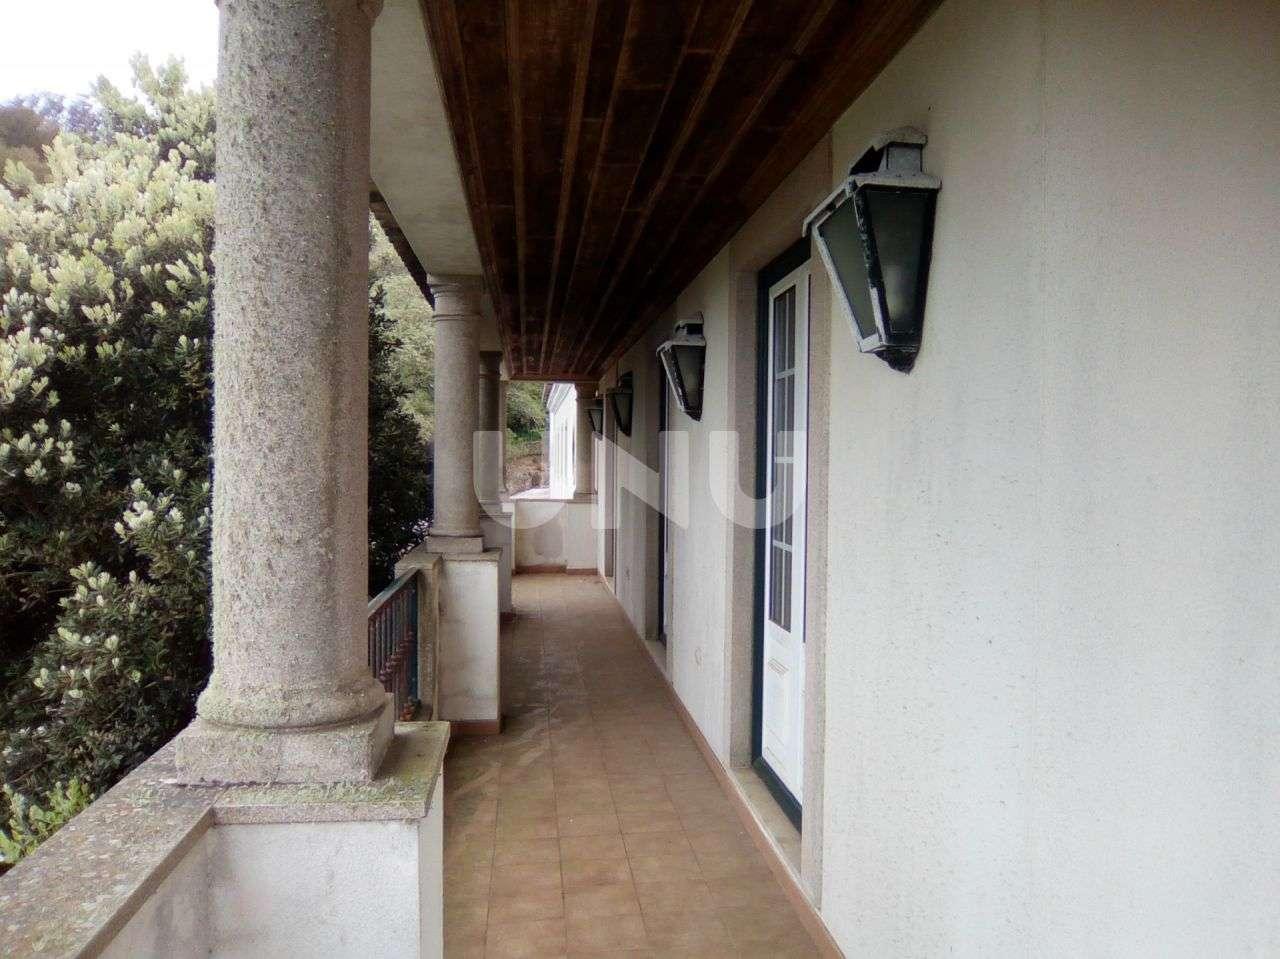 Quintas e herdades para comprar, Colares, Lisboa - Foto 13